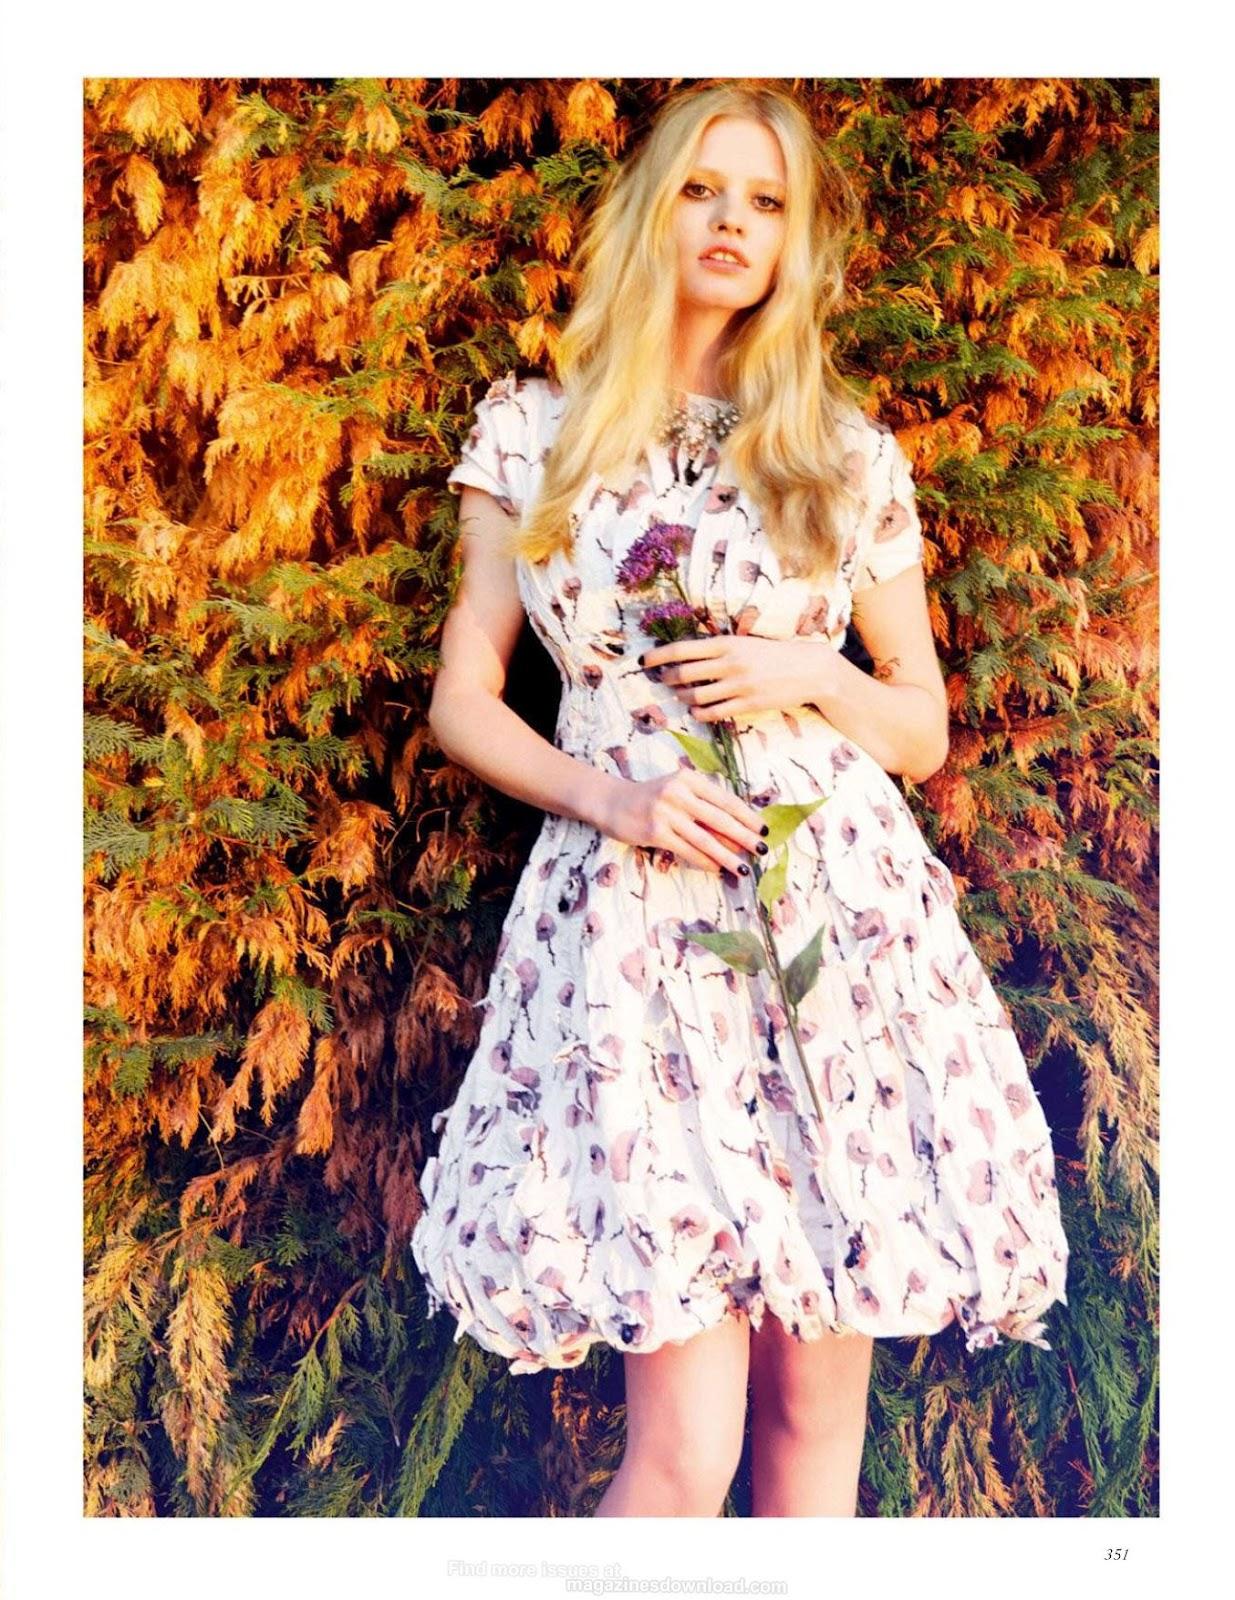 http://4.bp.blogspot.com/-bP8U-EukVIw/UCA0FJx9pAI/AAAAAAAAVOM/U0Rg265XbYI/s1600/Lara+Stone+-+Vogue+UK+September+2012+7.jpg